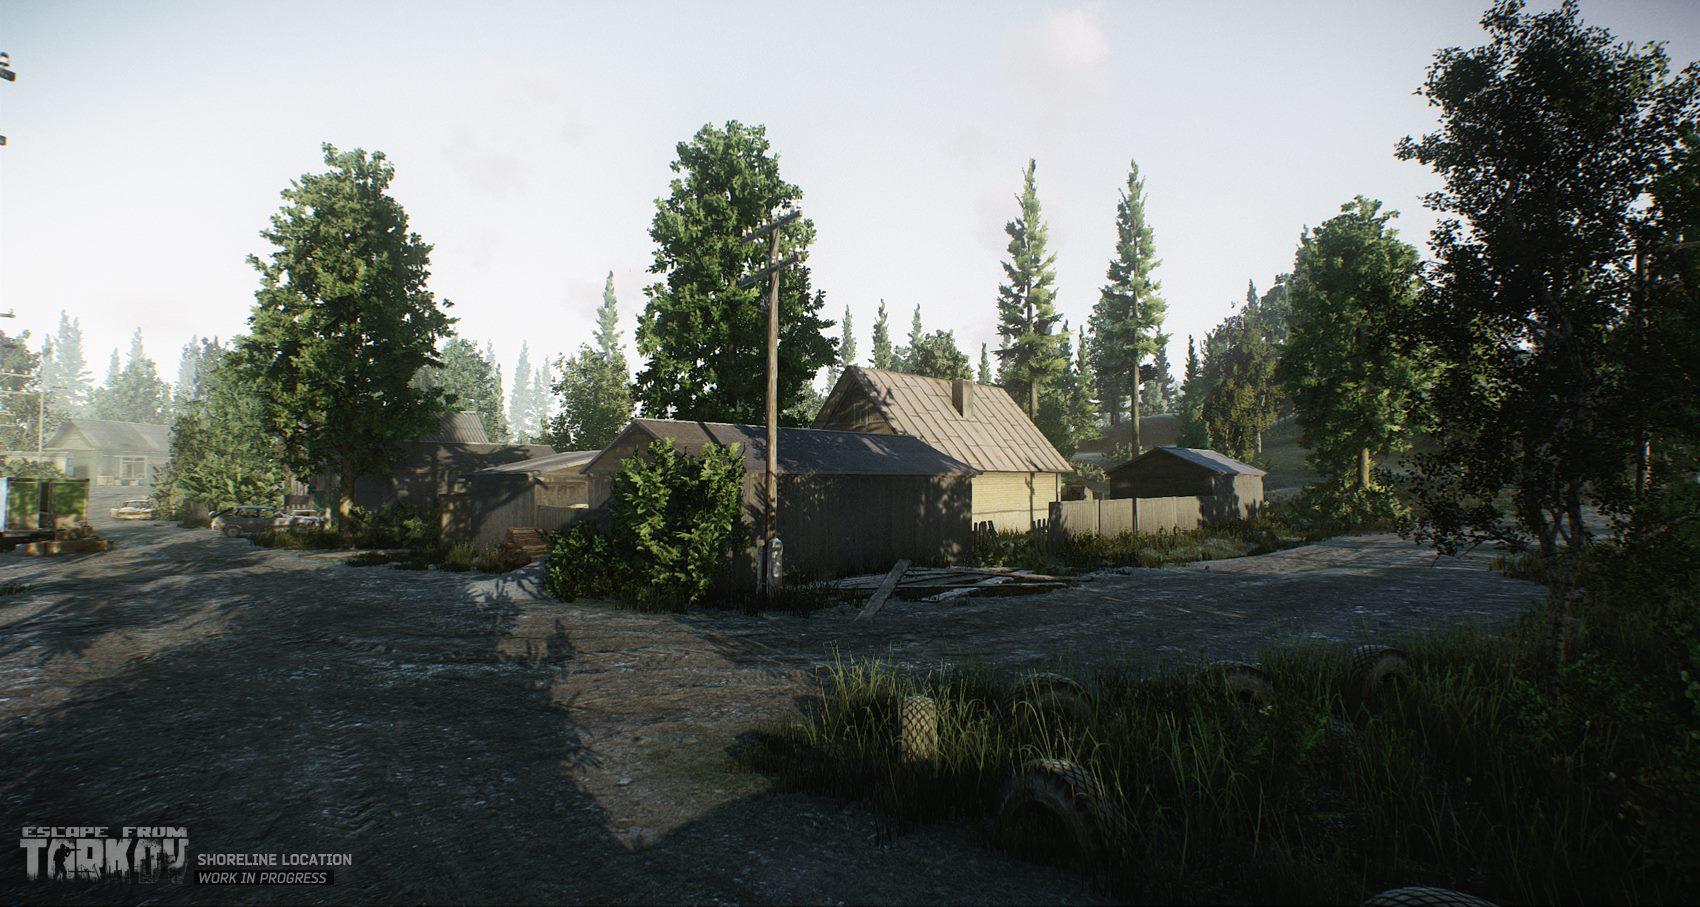 New beautiful Escape from Tarkov screenshots showcase the